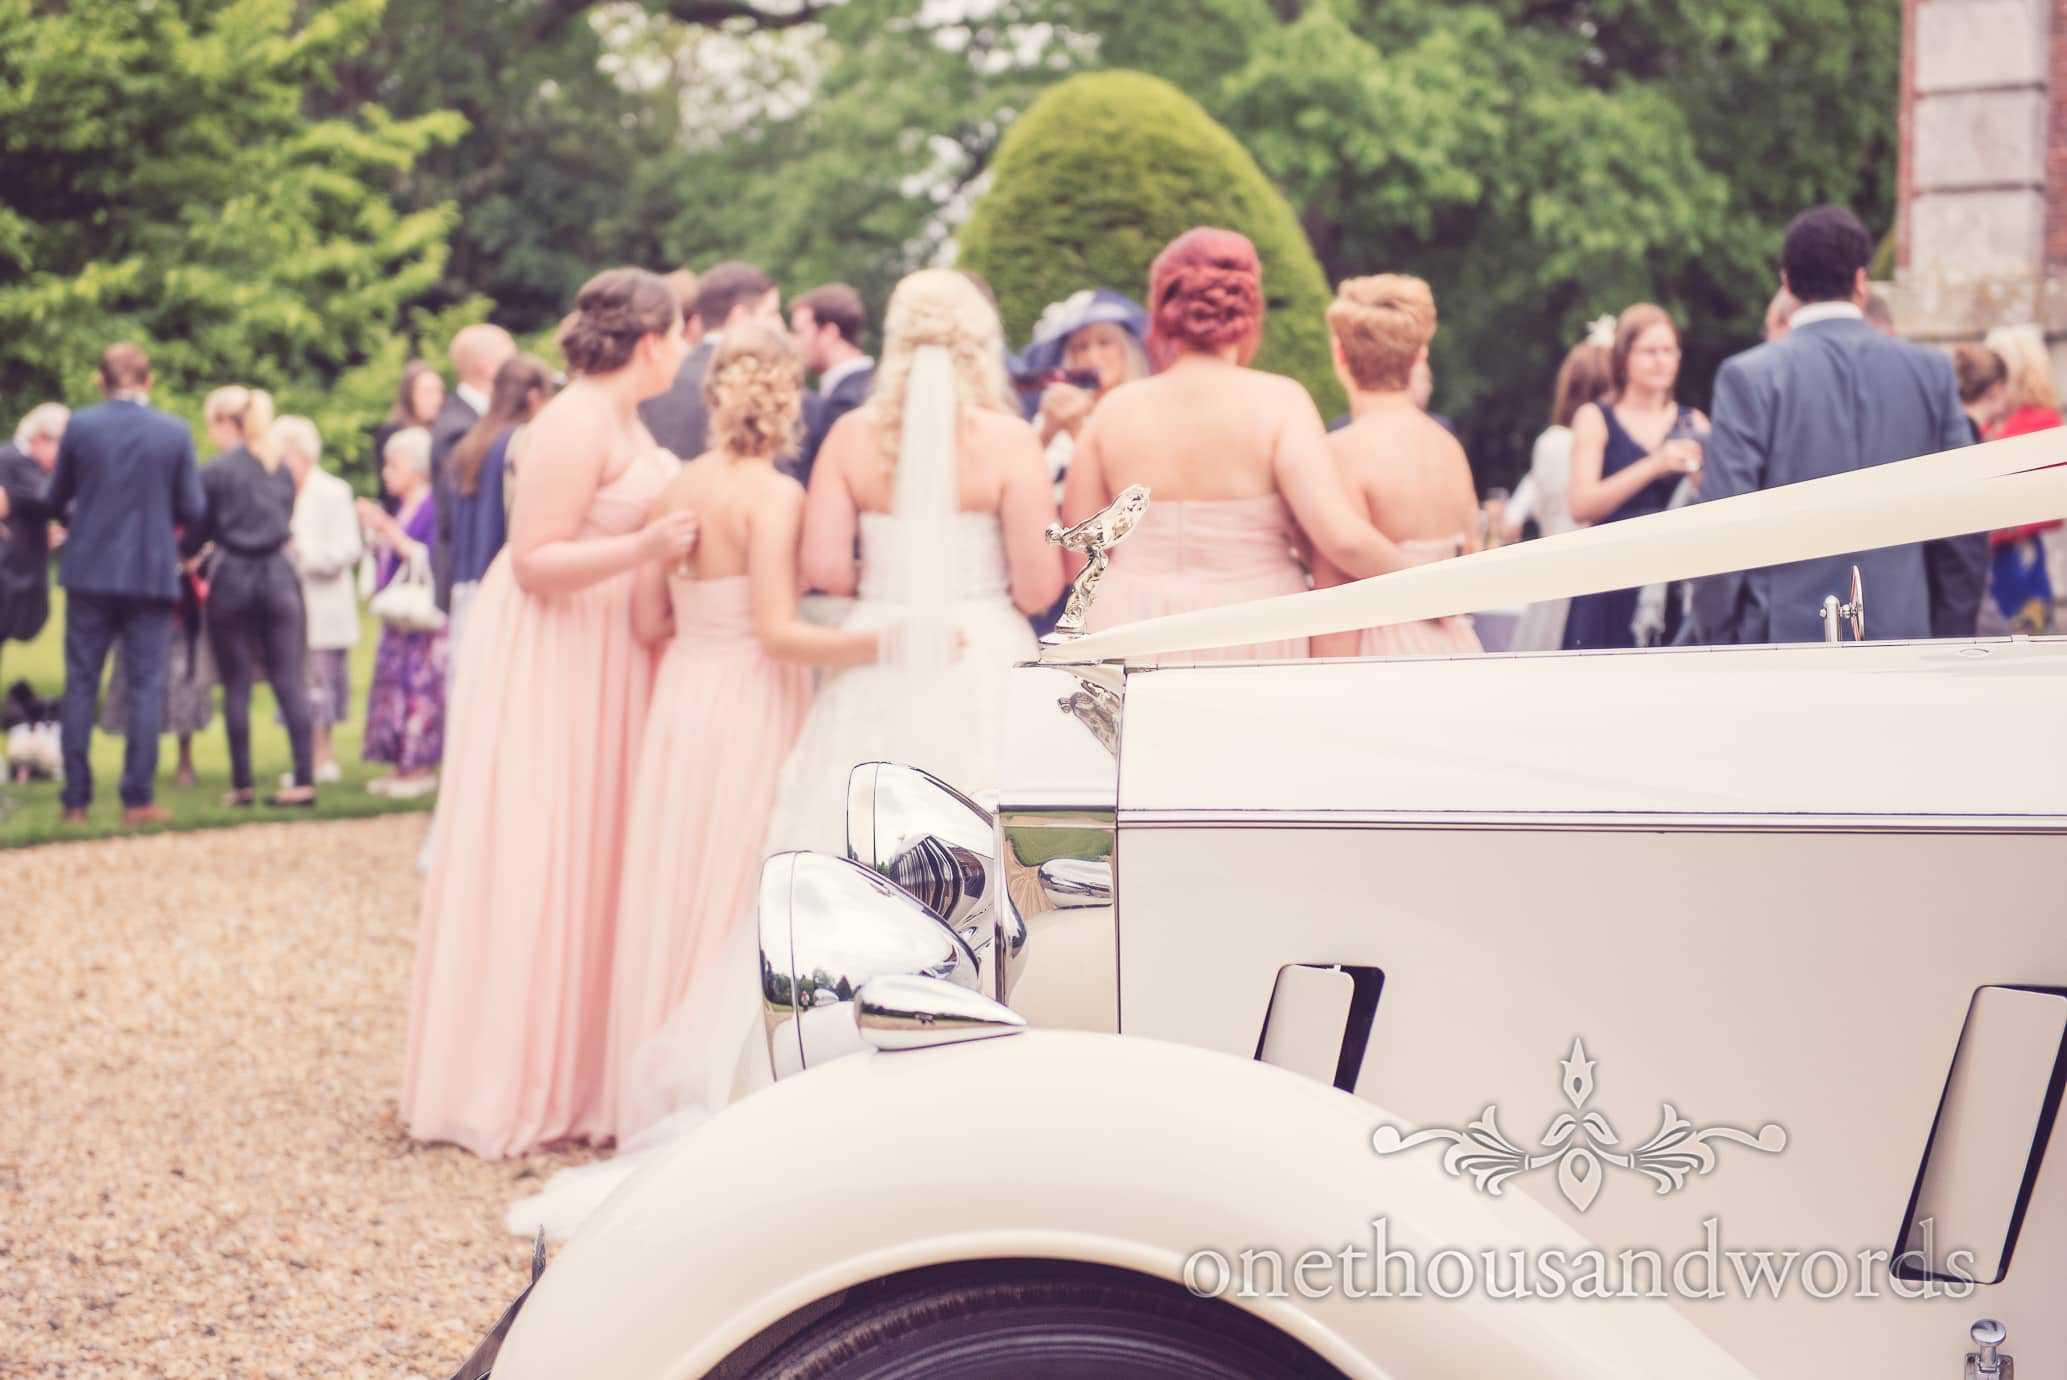 Classic Rolls Royce Wedding Car detail at Deans Court wedding reception